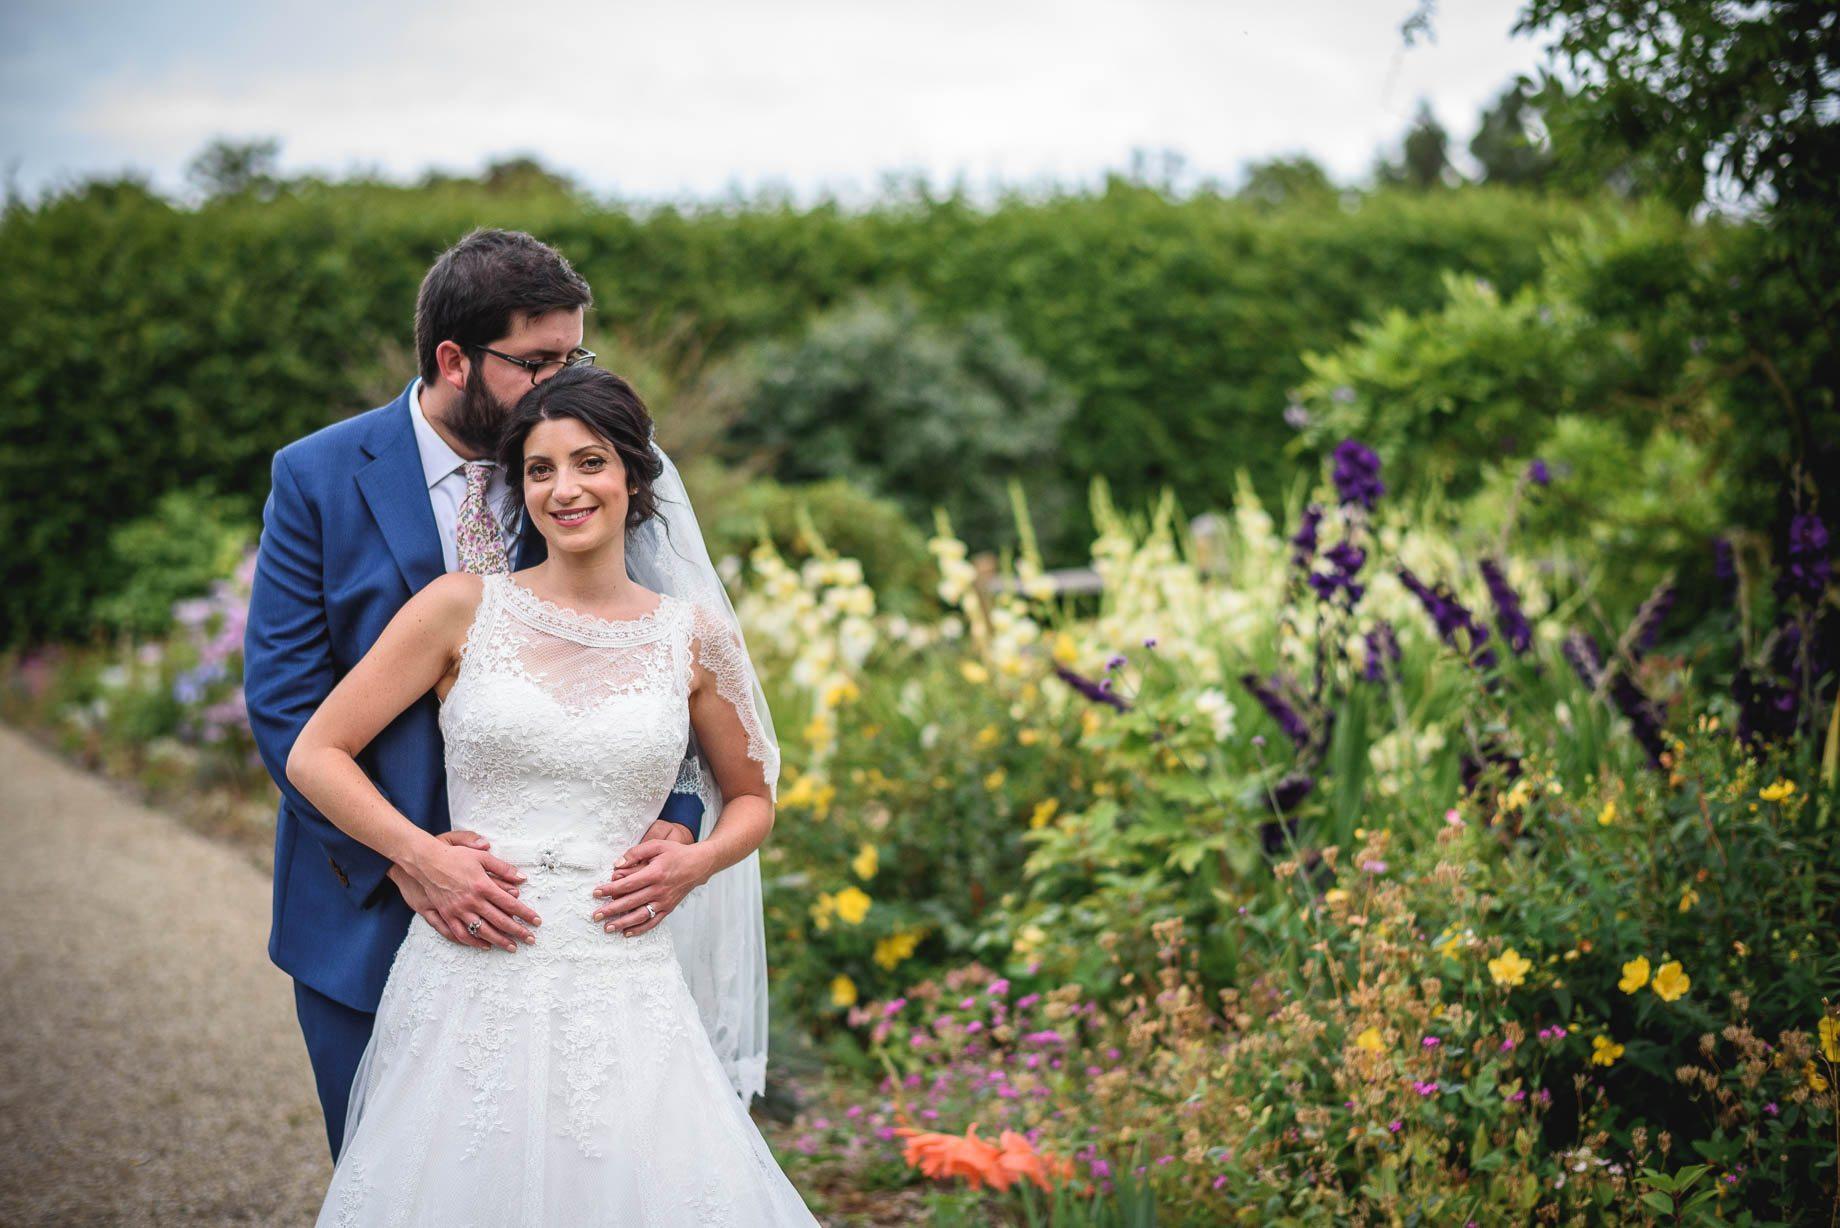 Gaynes Park wedding photography - Guy Collier Photography - Rachel and Jon (139 of 169)